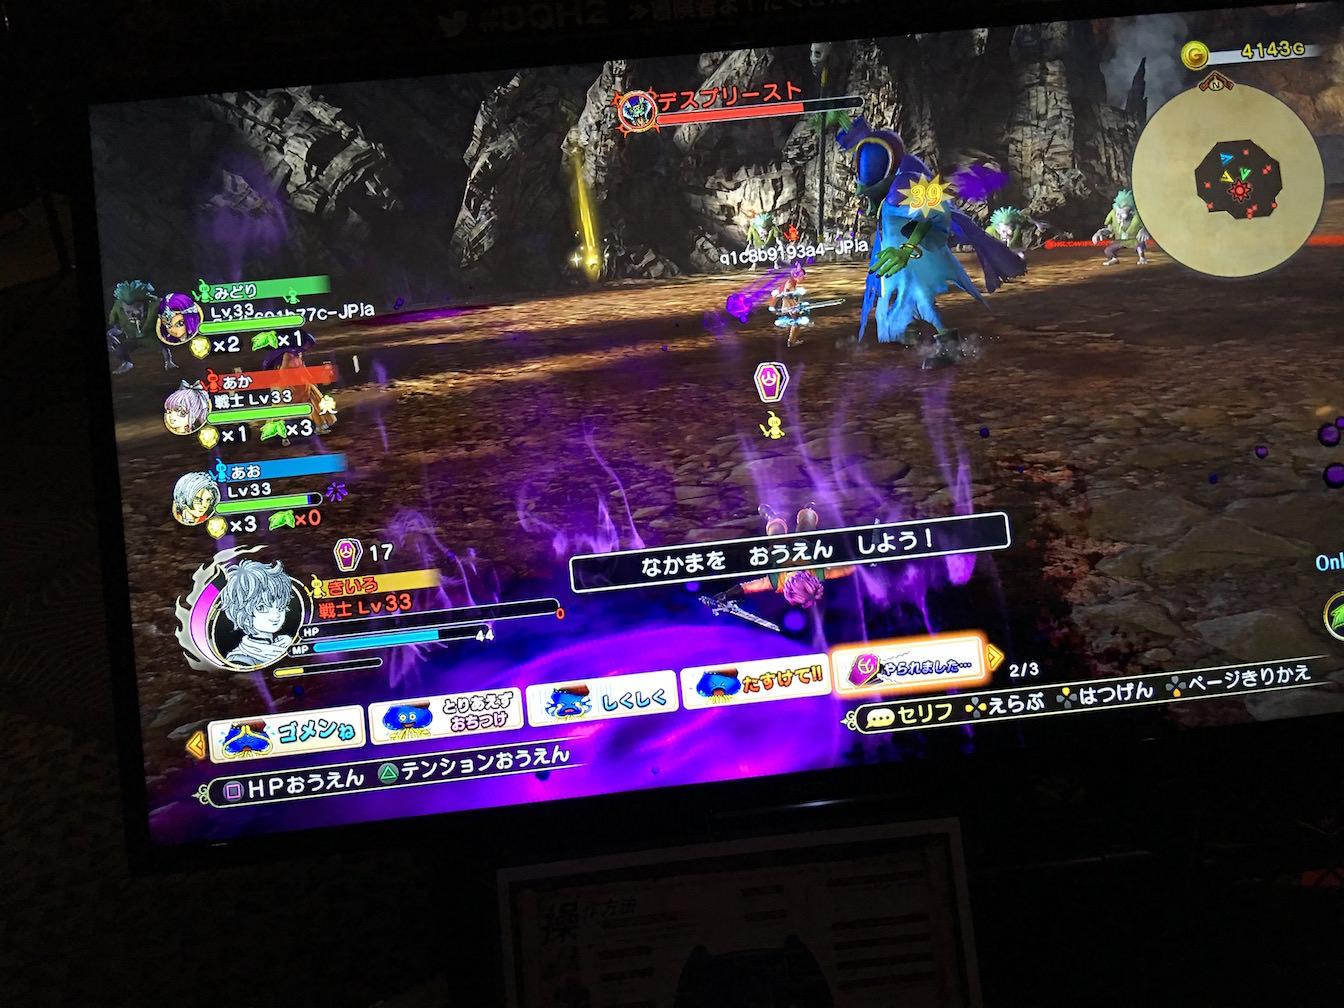 Dragon quest heros 2 premium experience meeting report 33